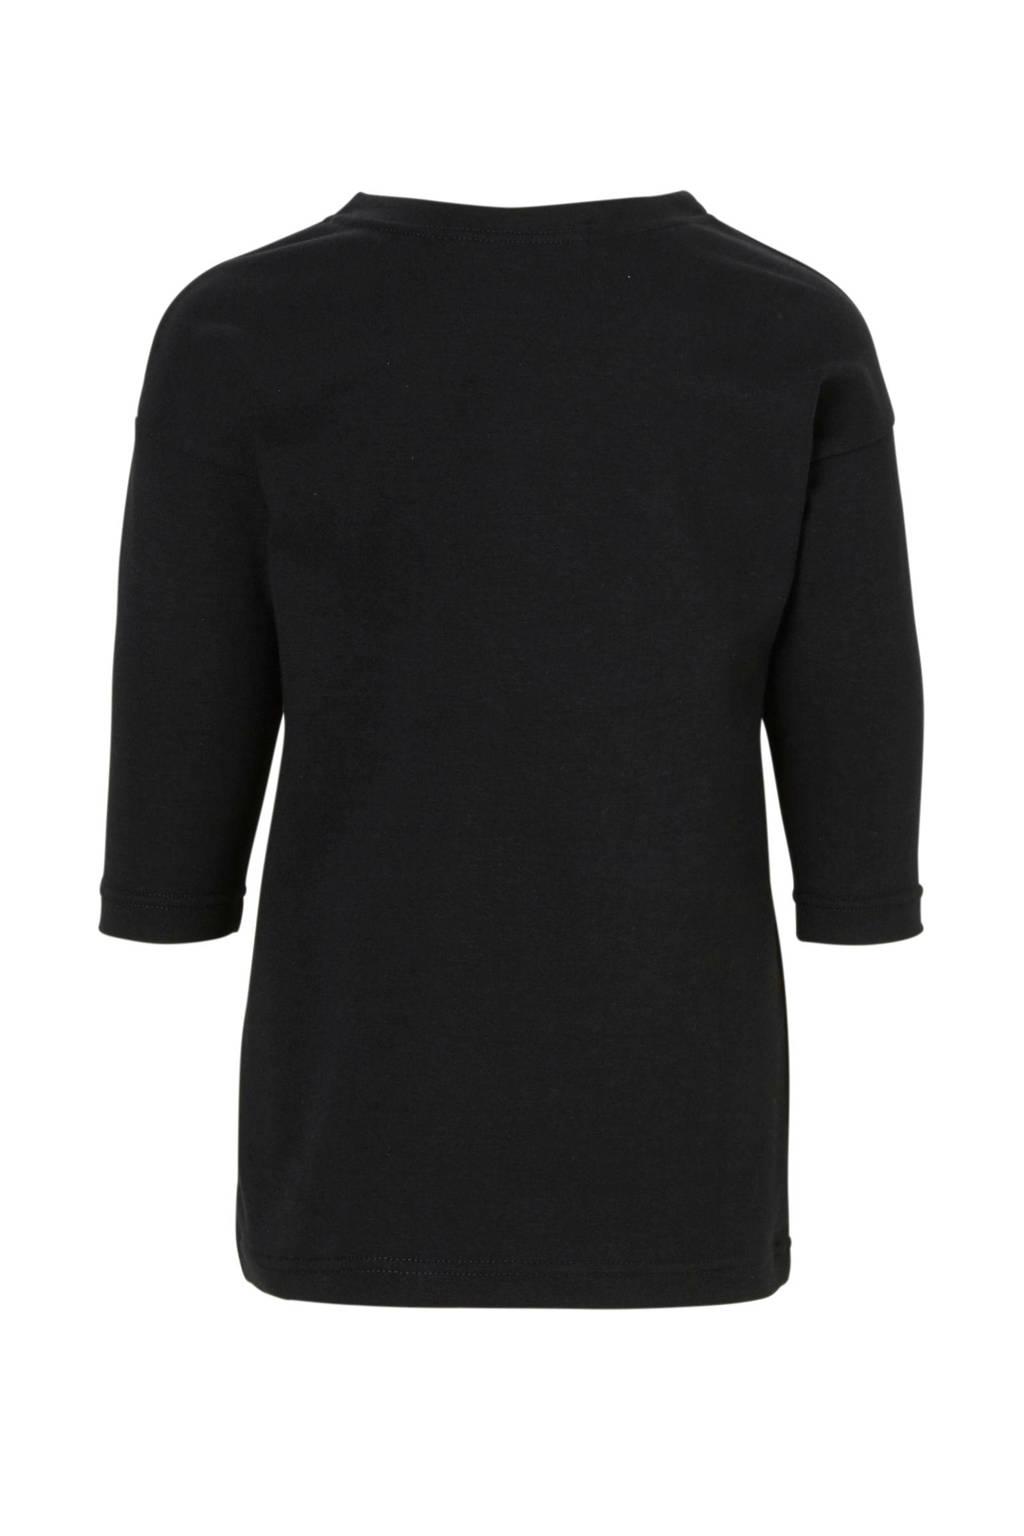 Your Wishes jurk met tekst zwart, Zwart/wit